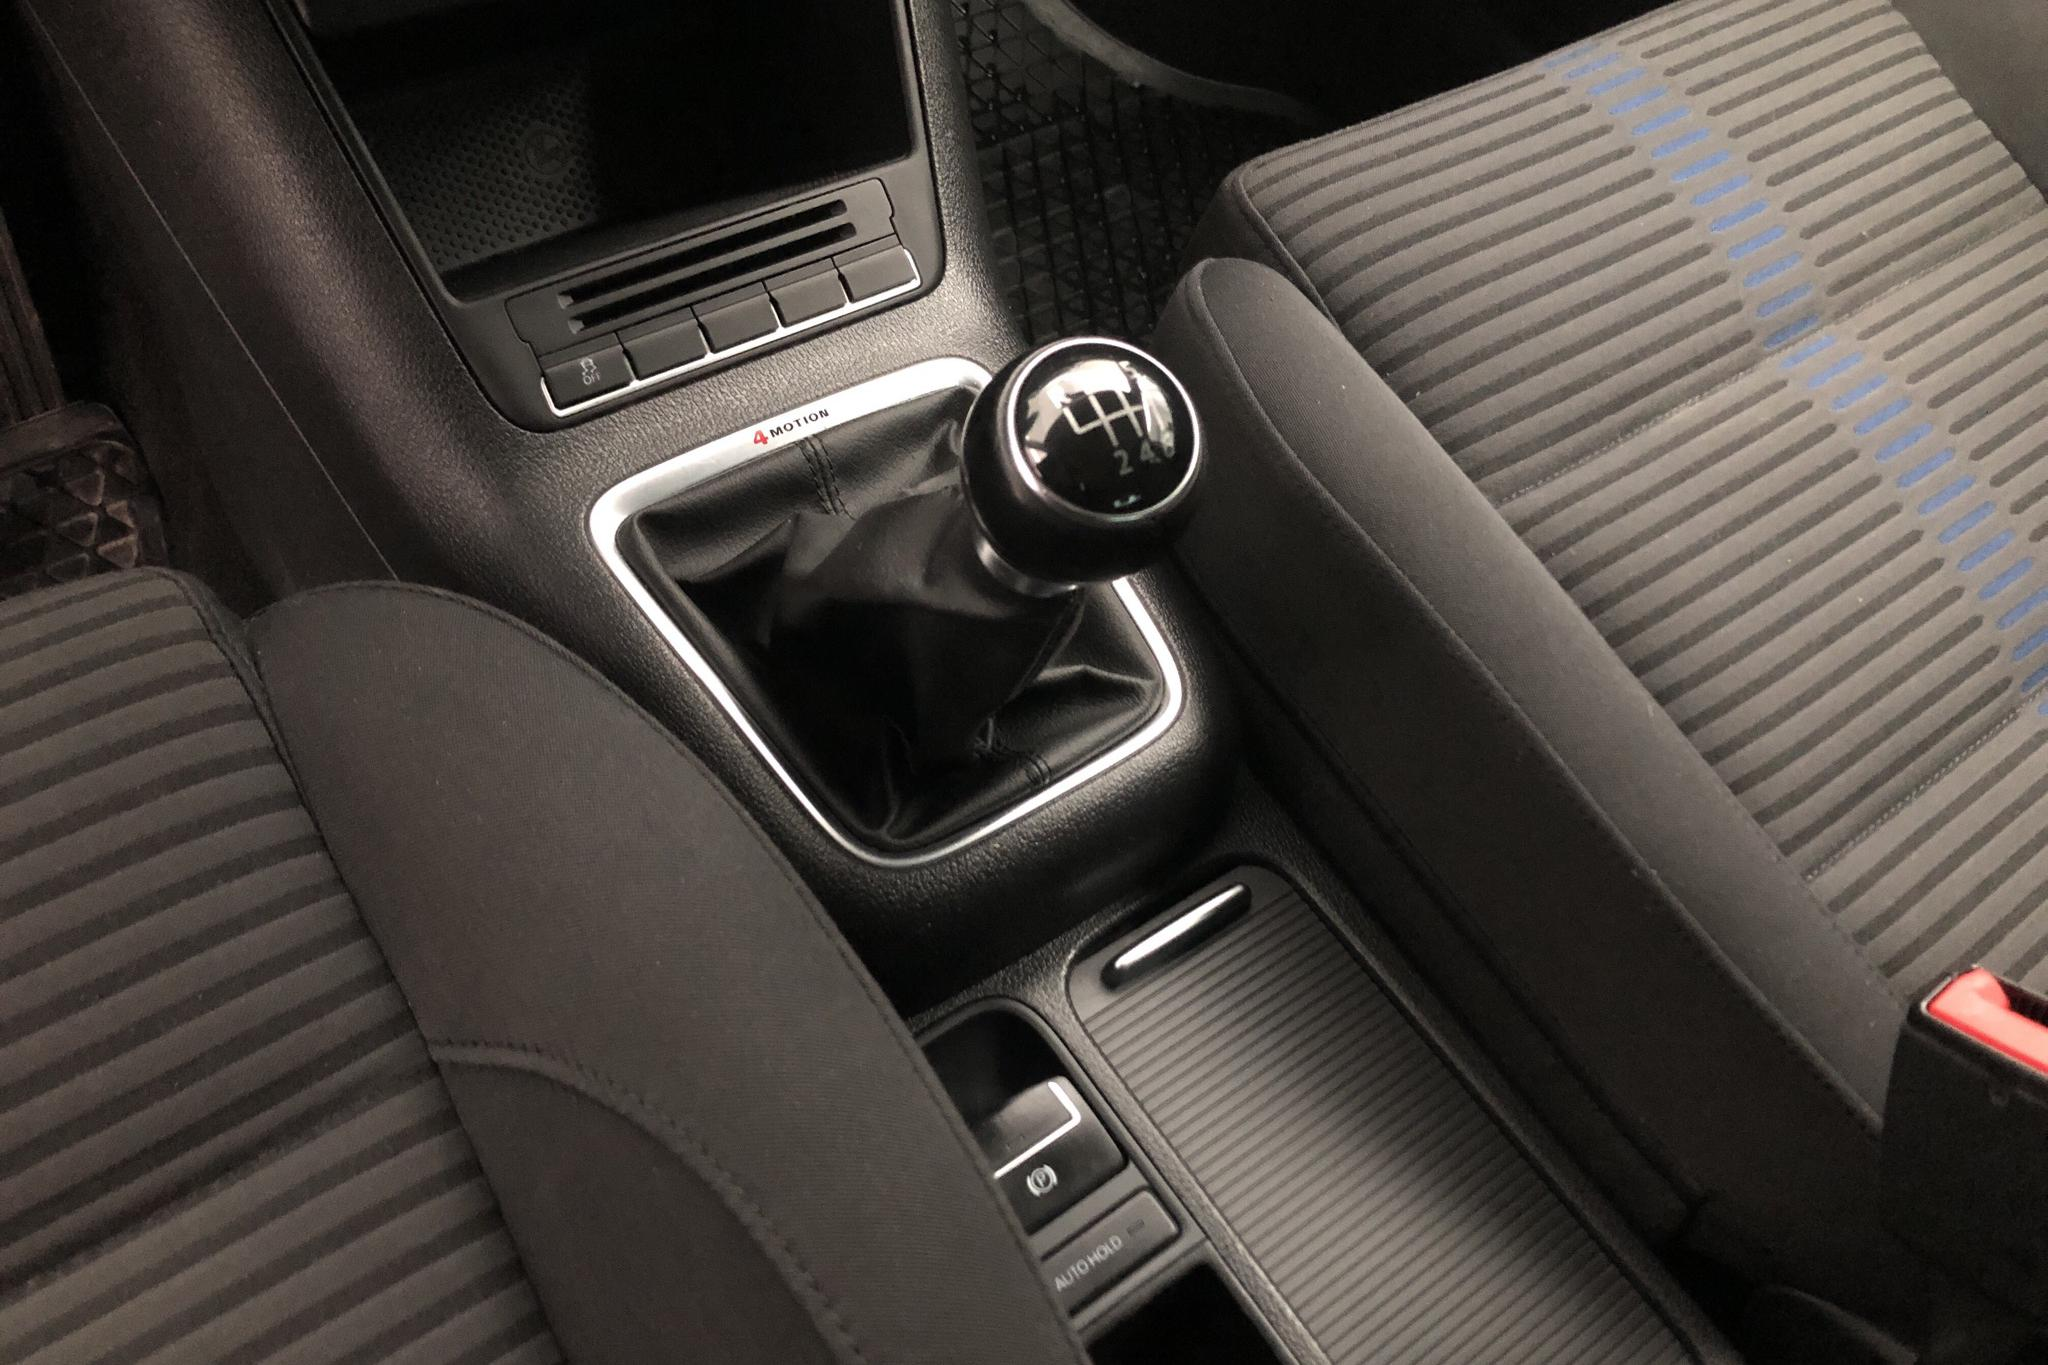 VW Tiguan 1.4 TSI (150hk) - 152 270 km - Manual - blue - 2010